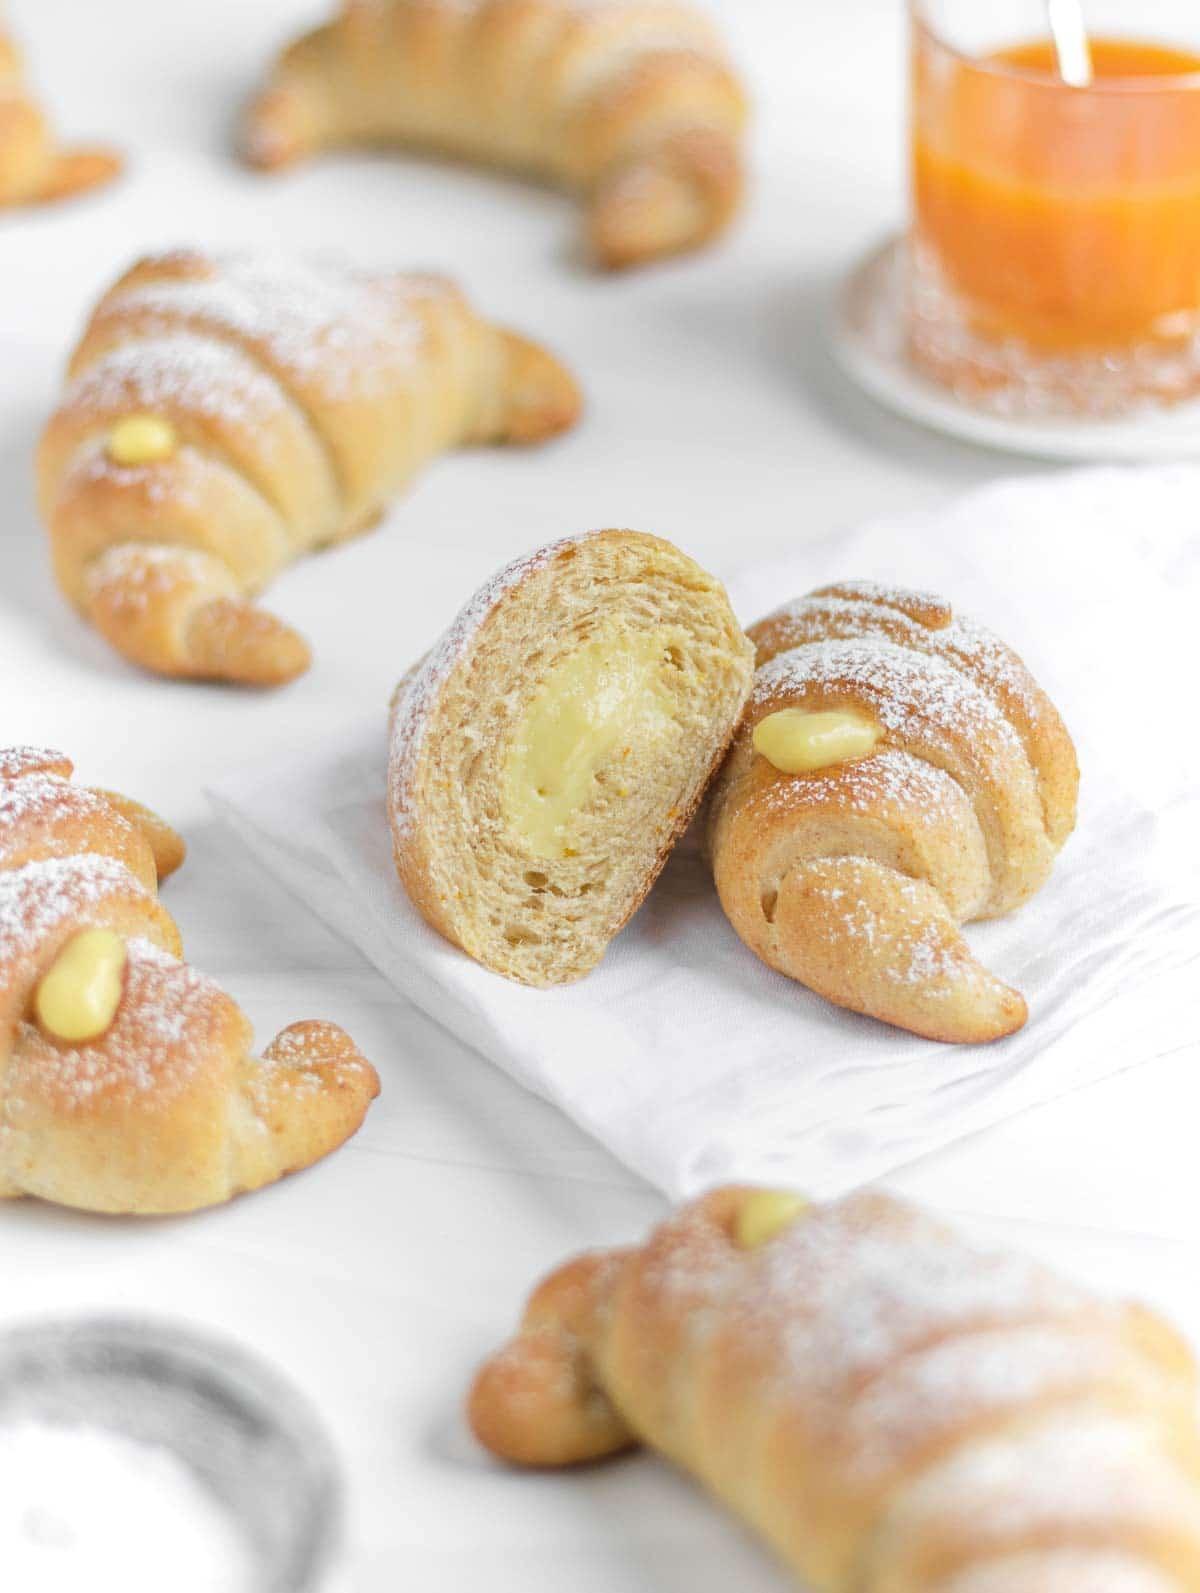 vegan cornetti - Italian croissants